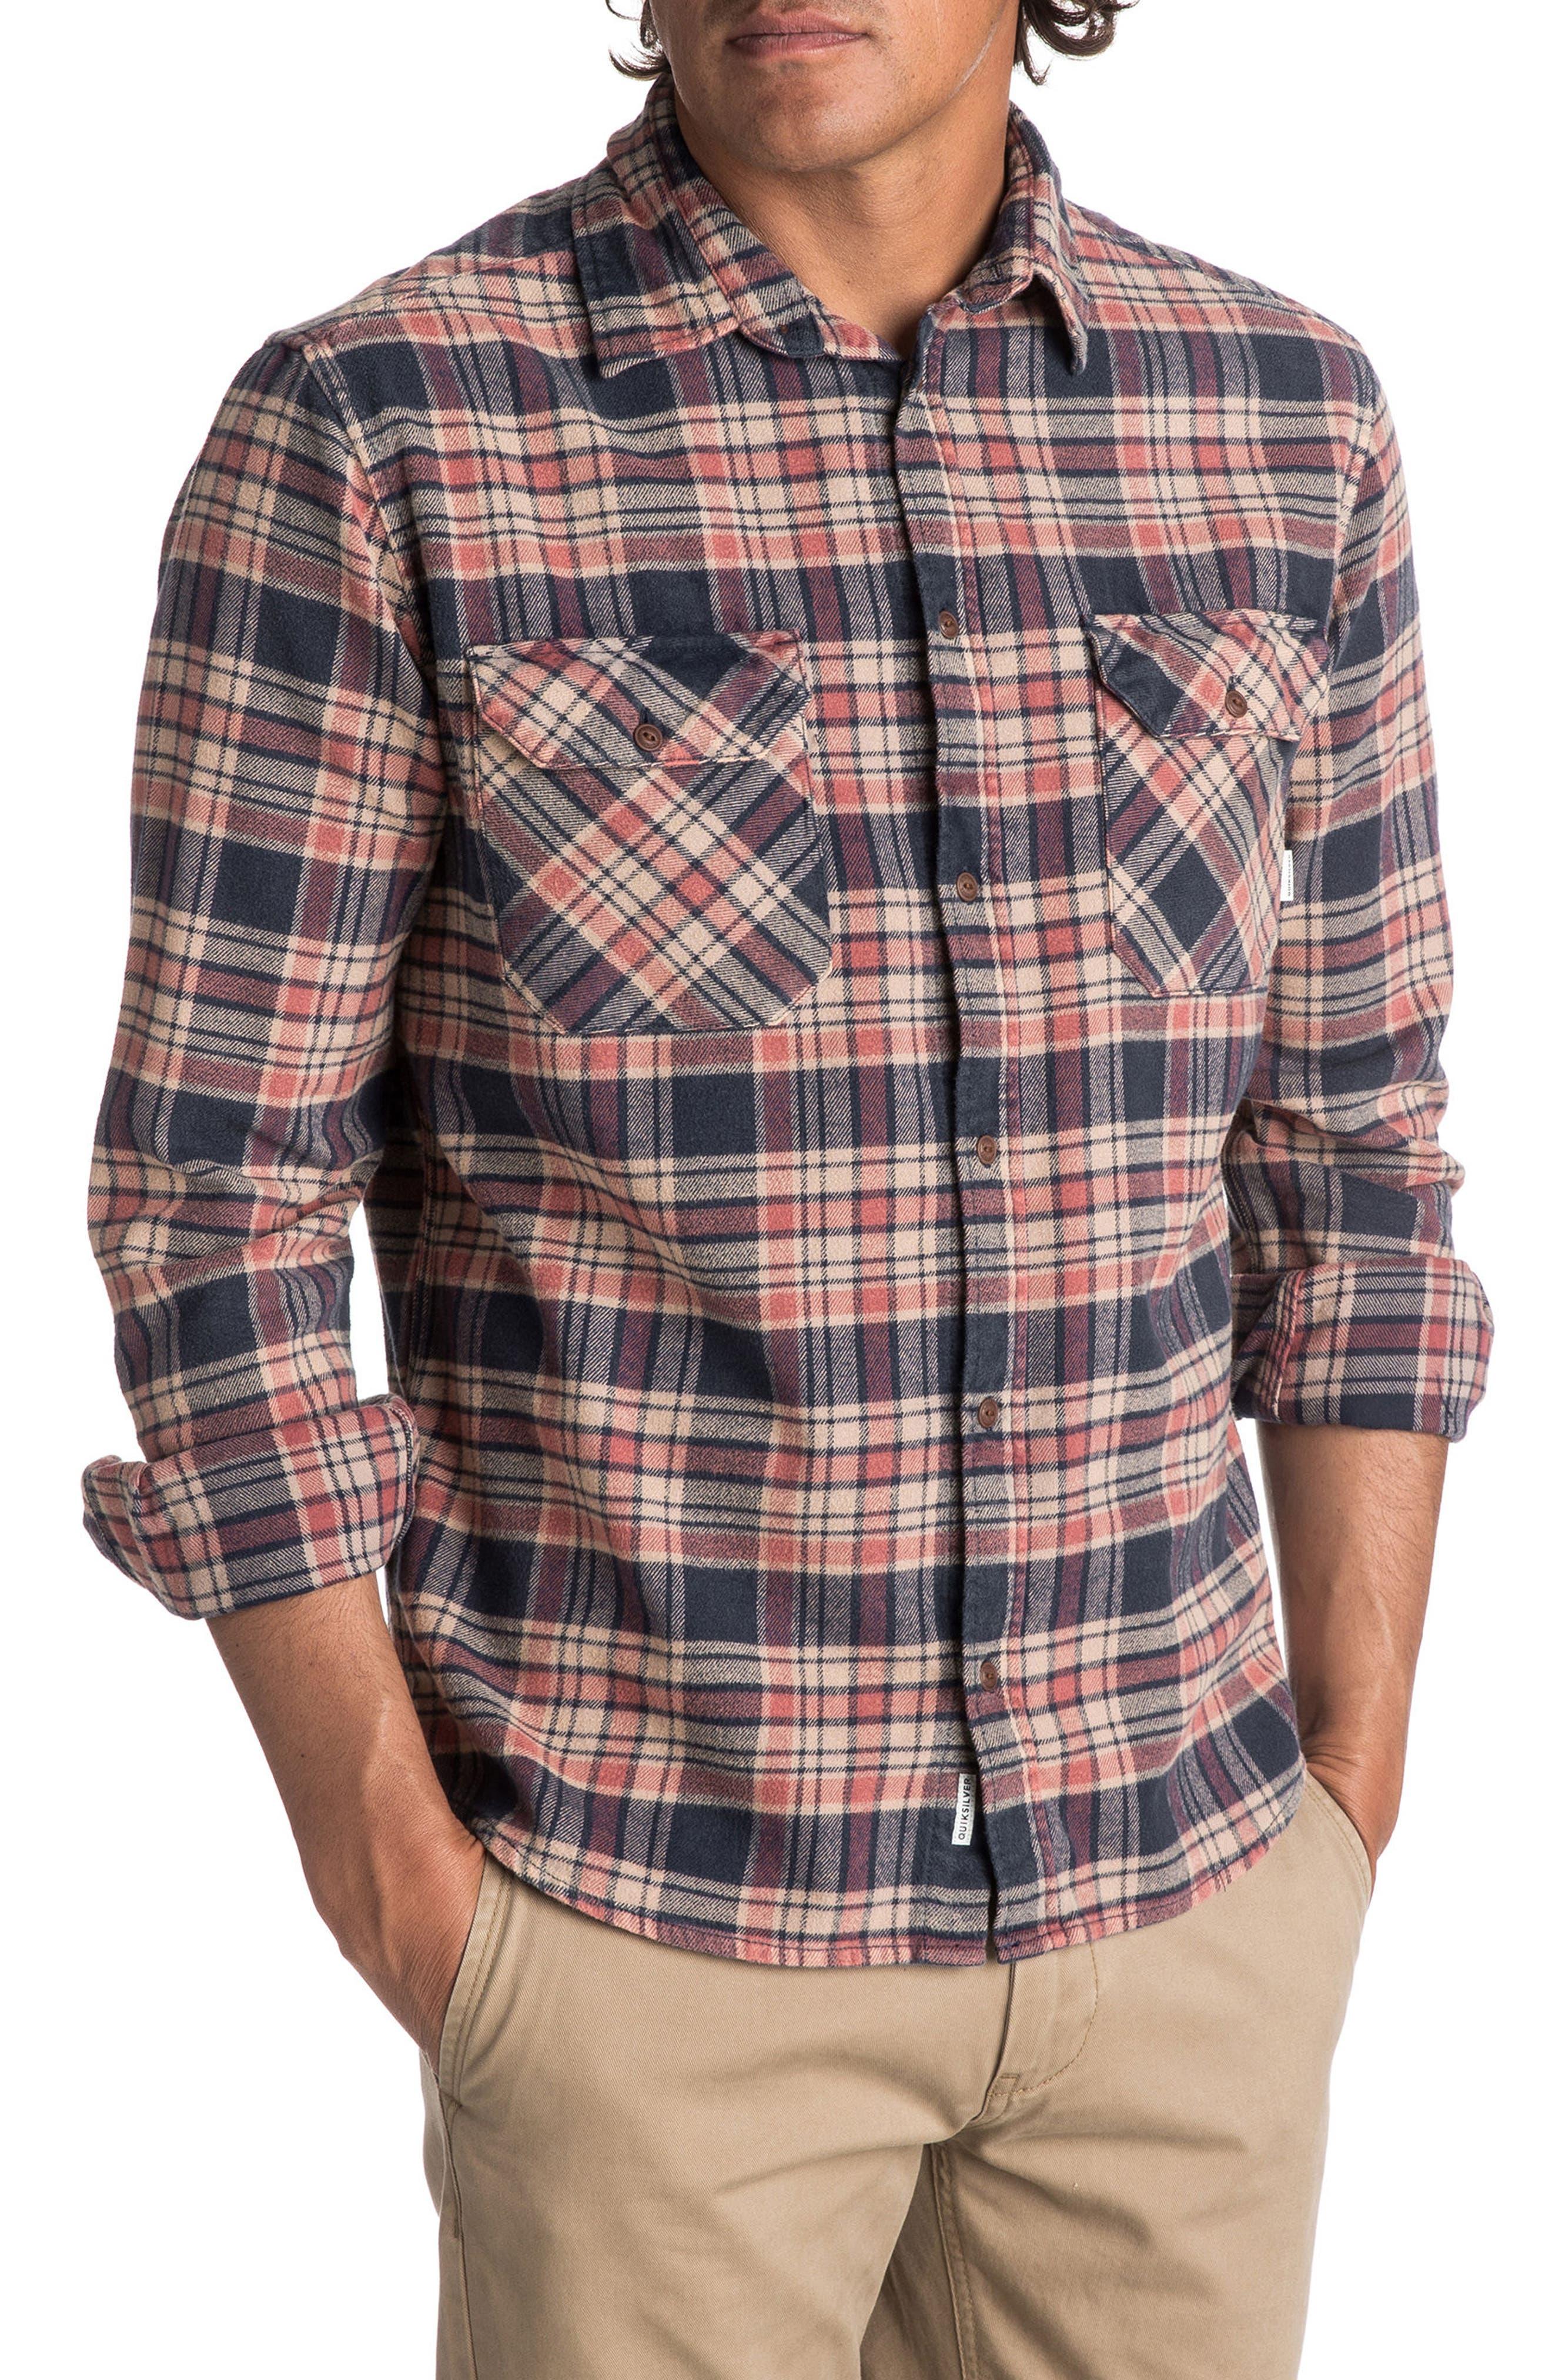 Alternate Image 1 Selected - Quiksilver Tangloop Plaid Flannel Shirt